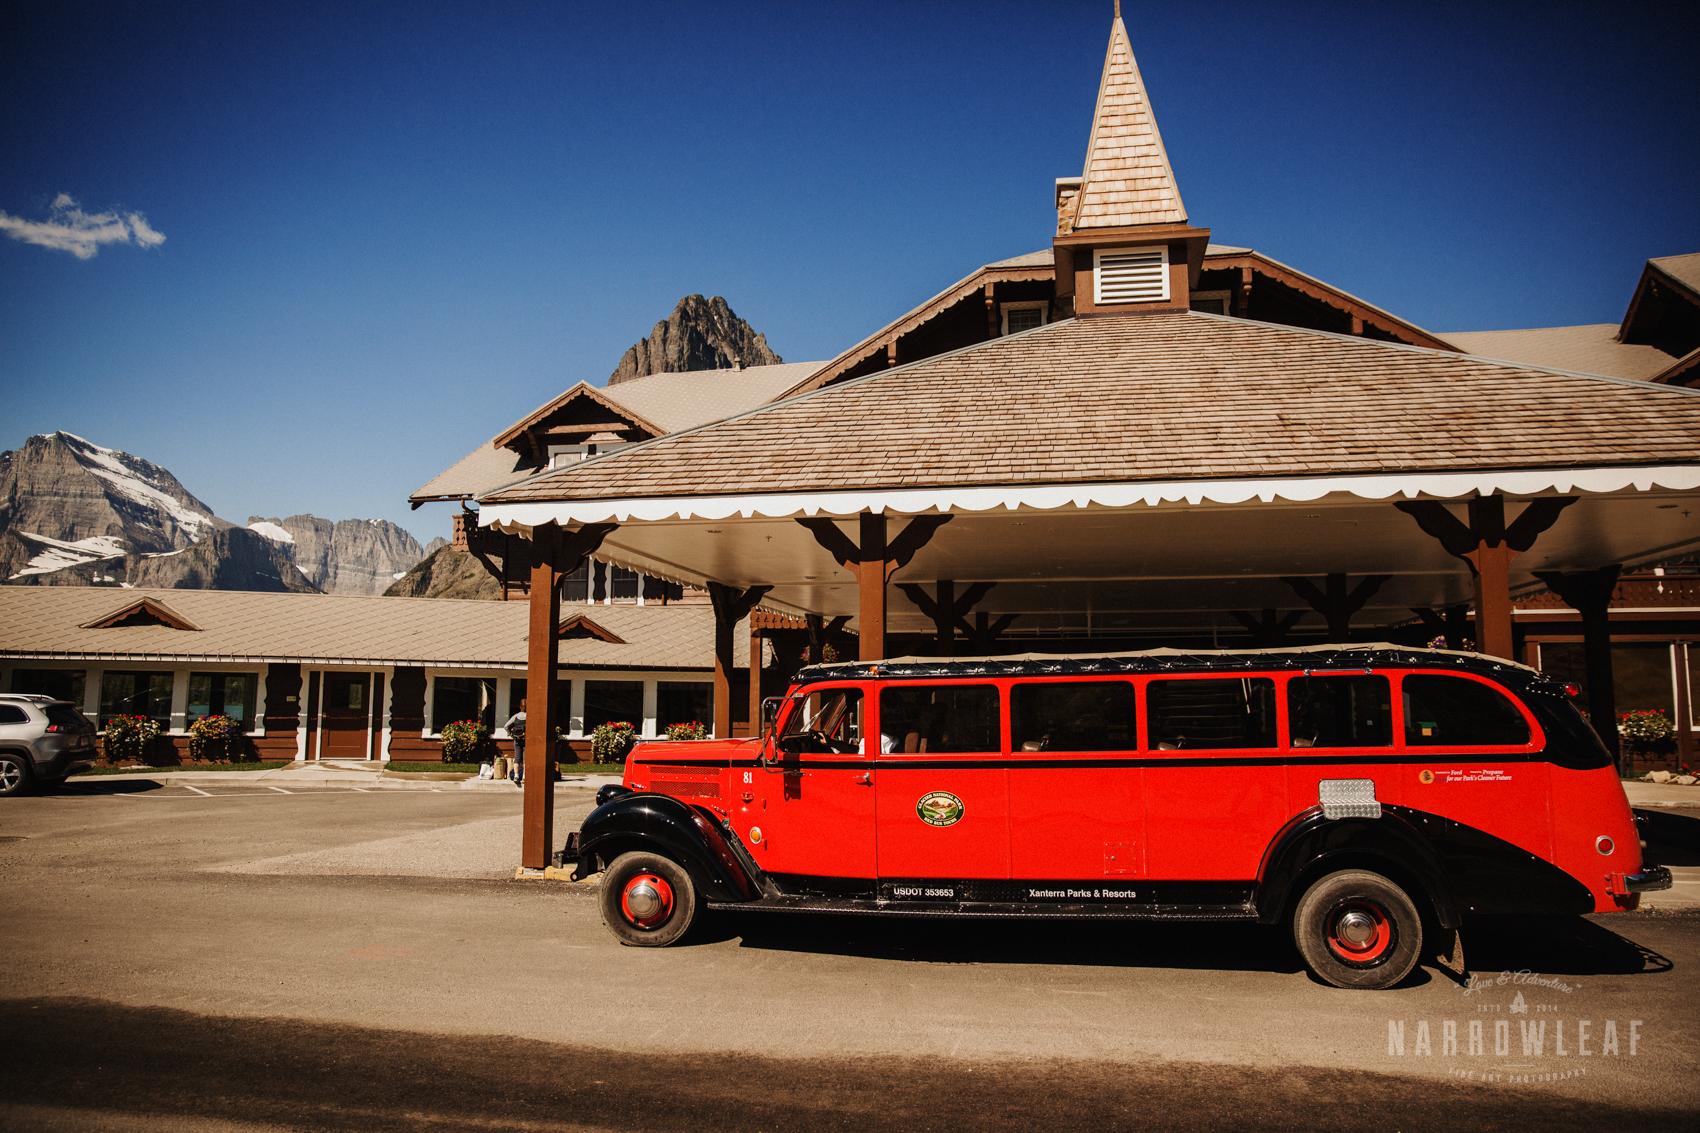 Montana-Montana-Many-Glacier-hotel-Narrowleaf-Love-and-Adventure-elopement-Photography-9337.jpg